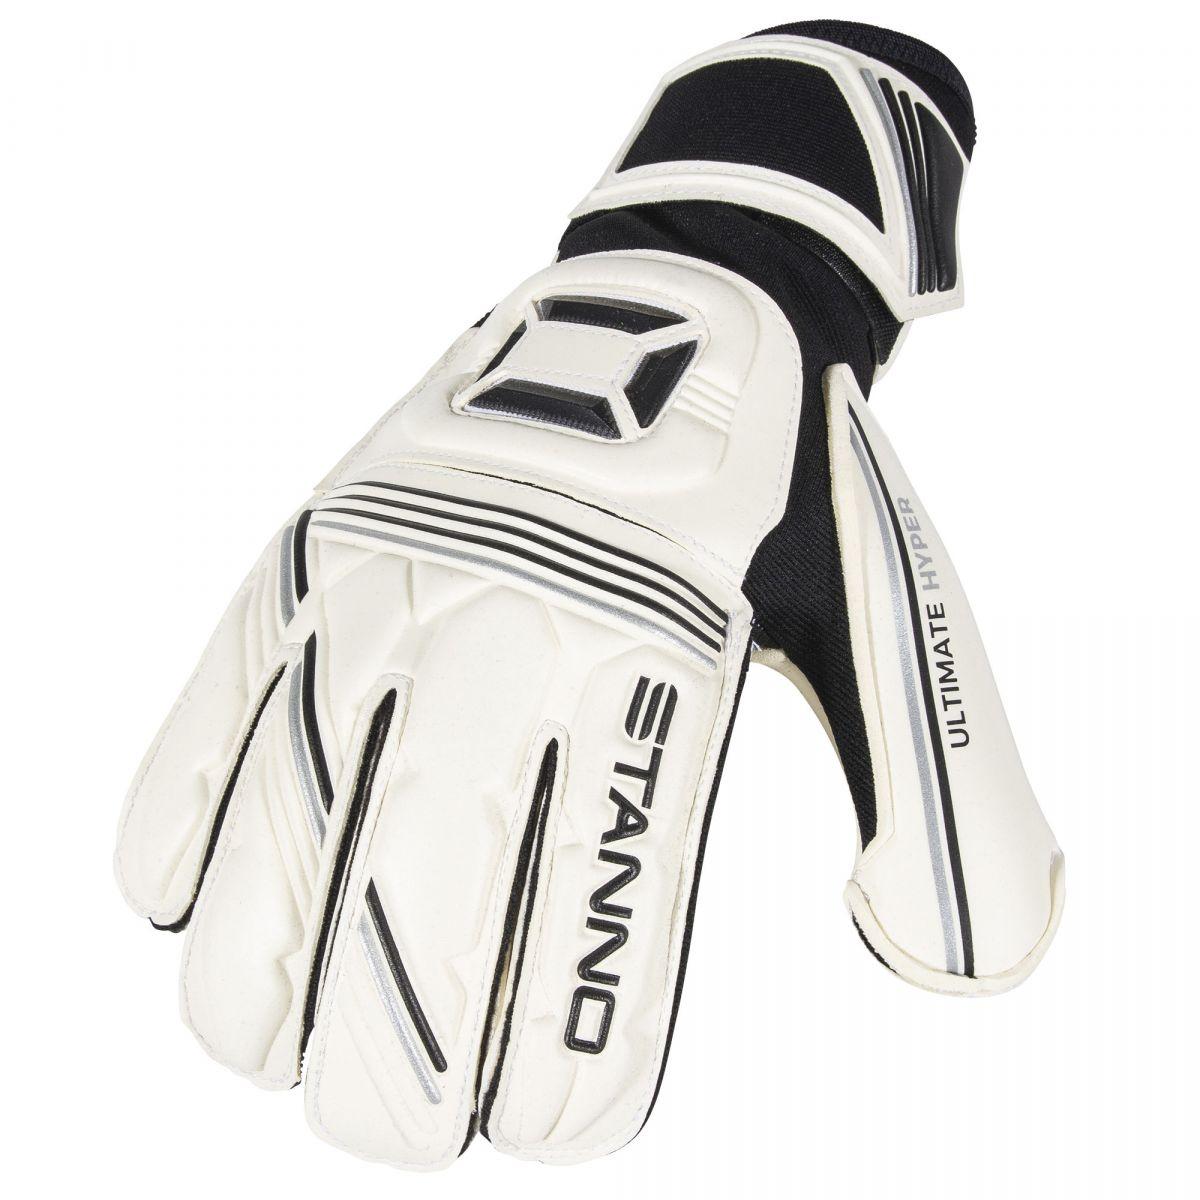 Stanno Ultimate Grip Roll Finger Hyper Goalkeeper Gloves Size